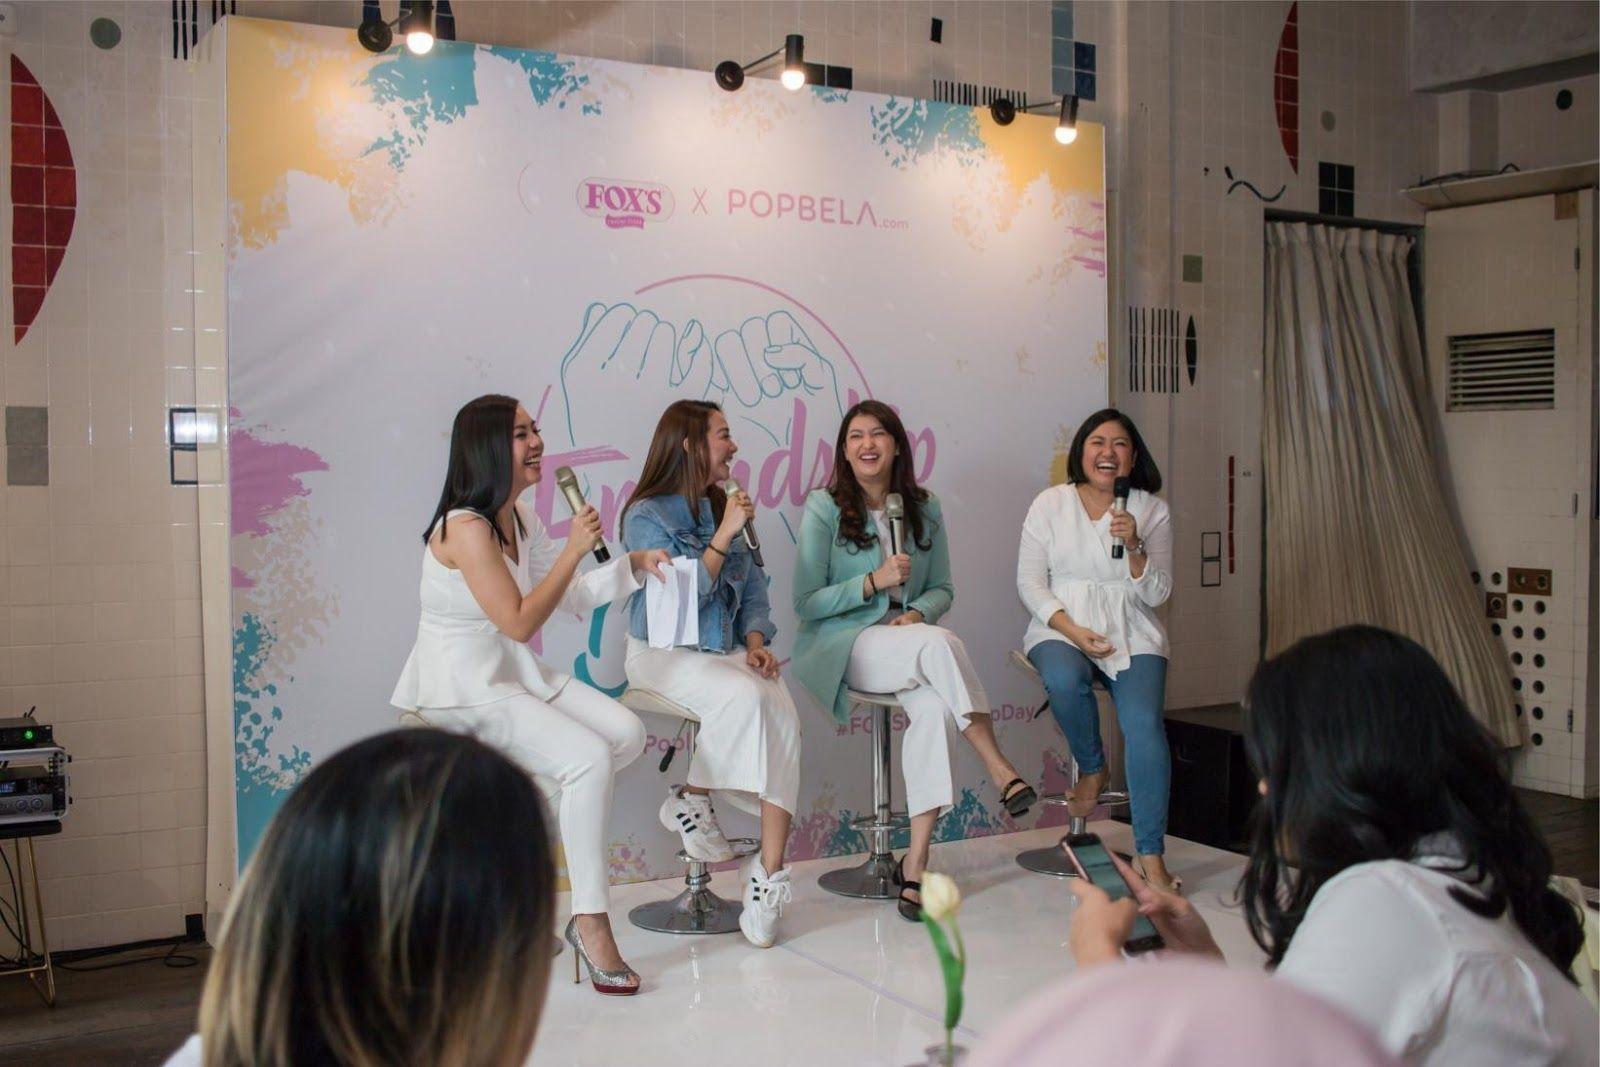 Intip Serunya Persahabatan Jasmine Nadiko dan Dewi Paramita Yuk!